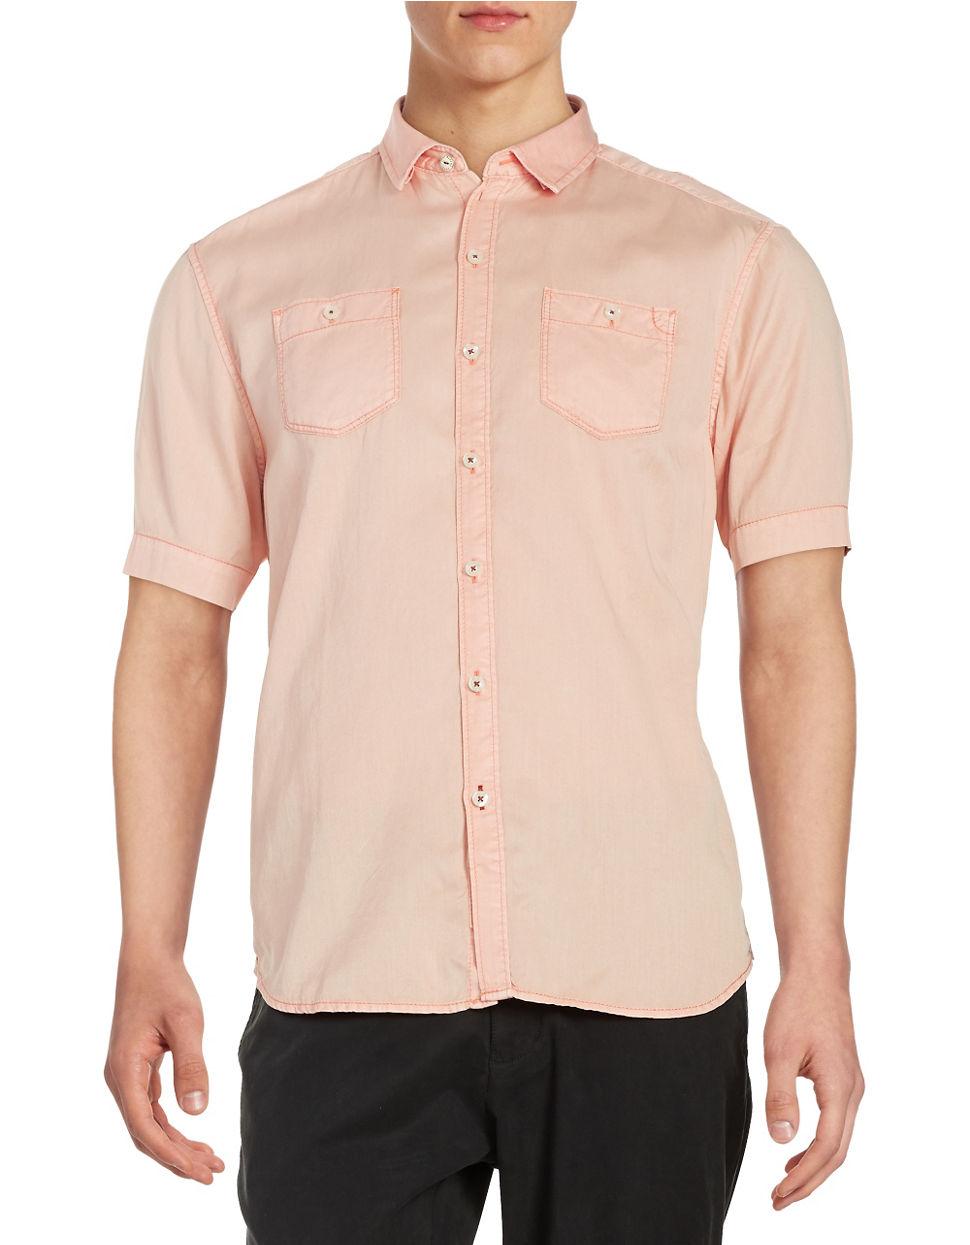 Lyst tommy bahama peace short sleeve sportshirt in for Custom tommy bahama shirts